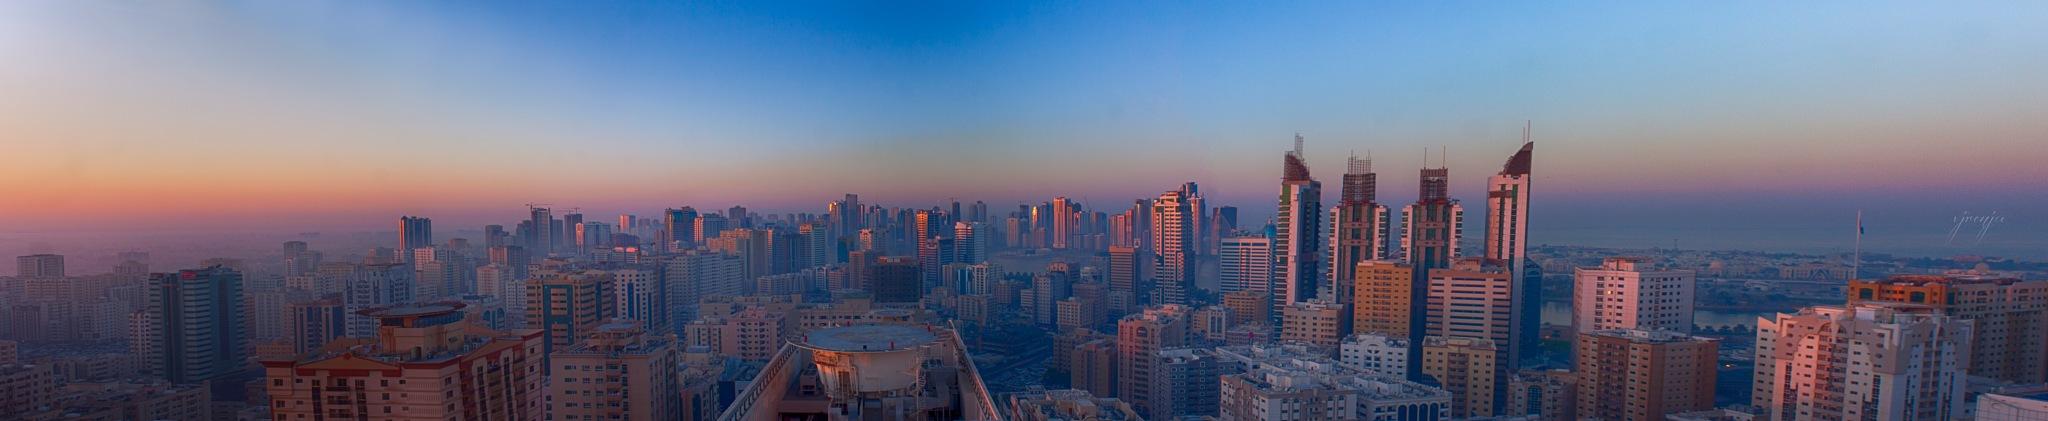 The panoramic view by VJ Renju